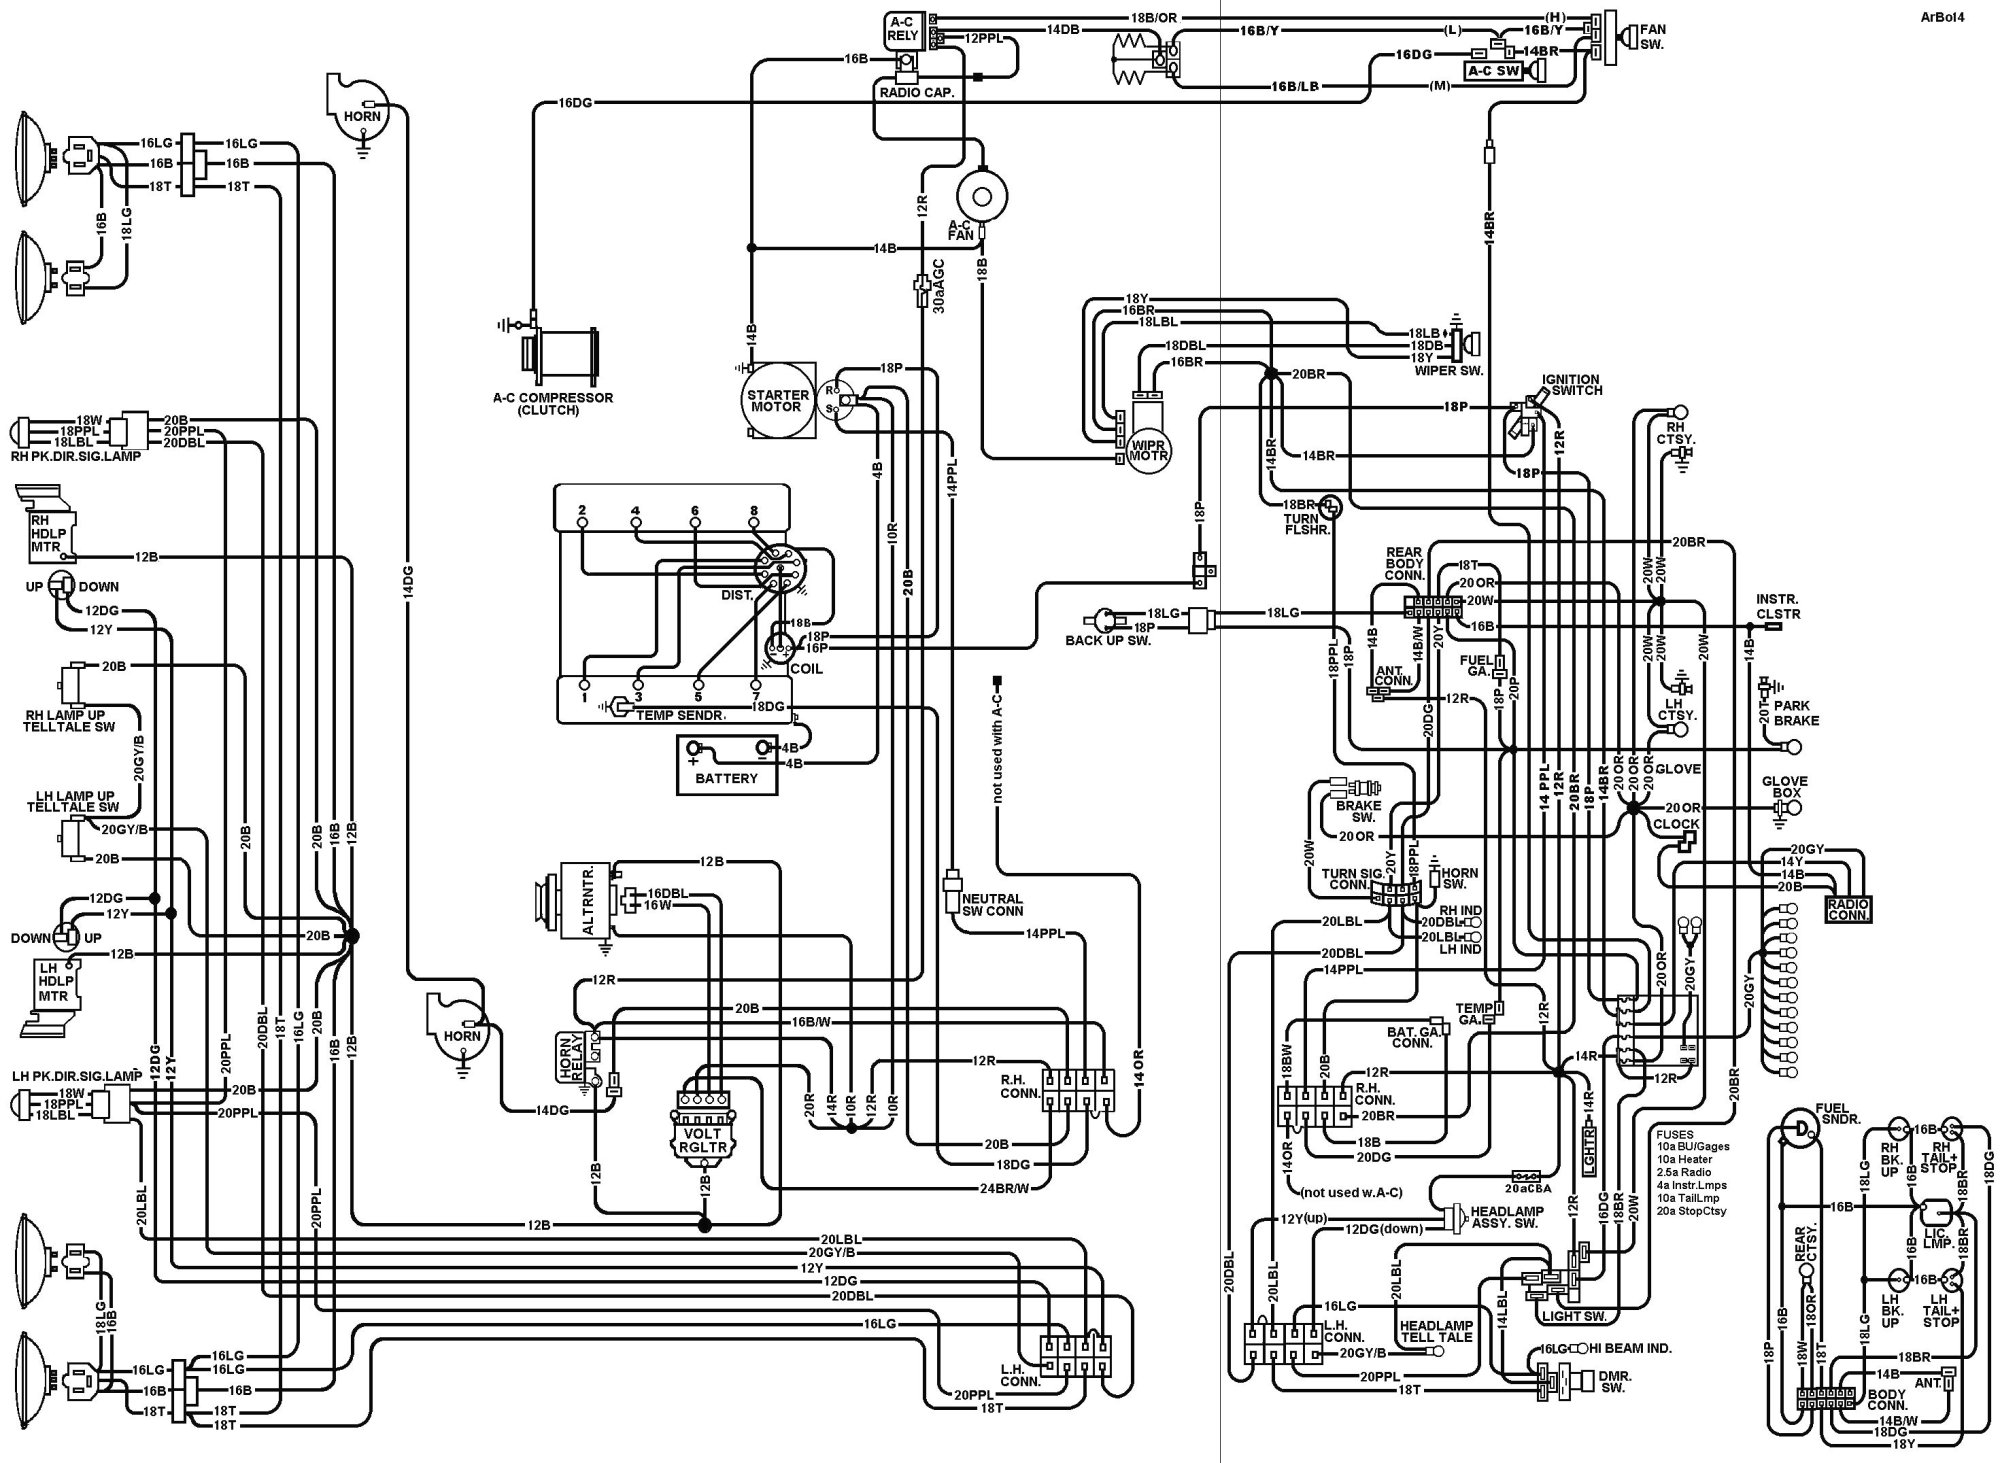 hight resolution of 86 corvette cooling fan wiring diagram 1986 corvette